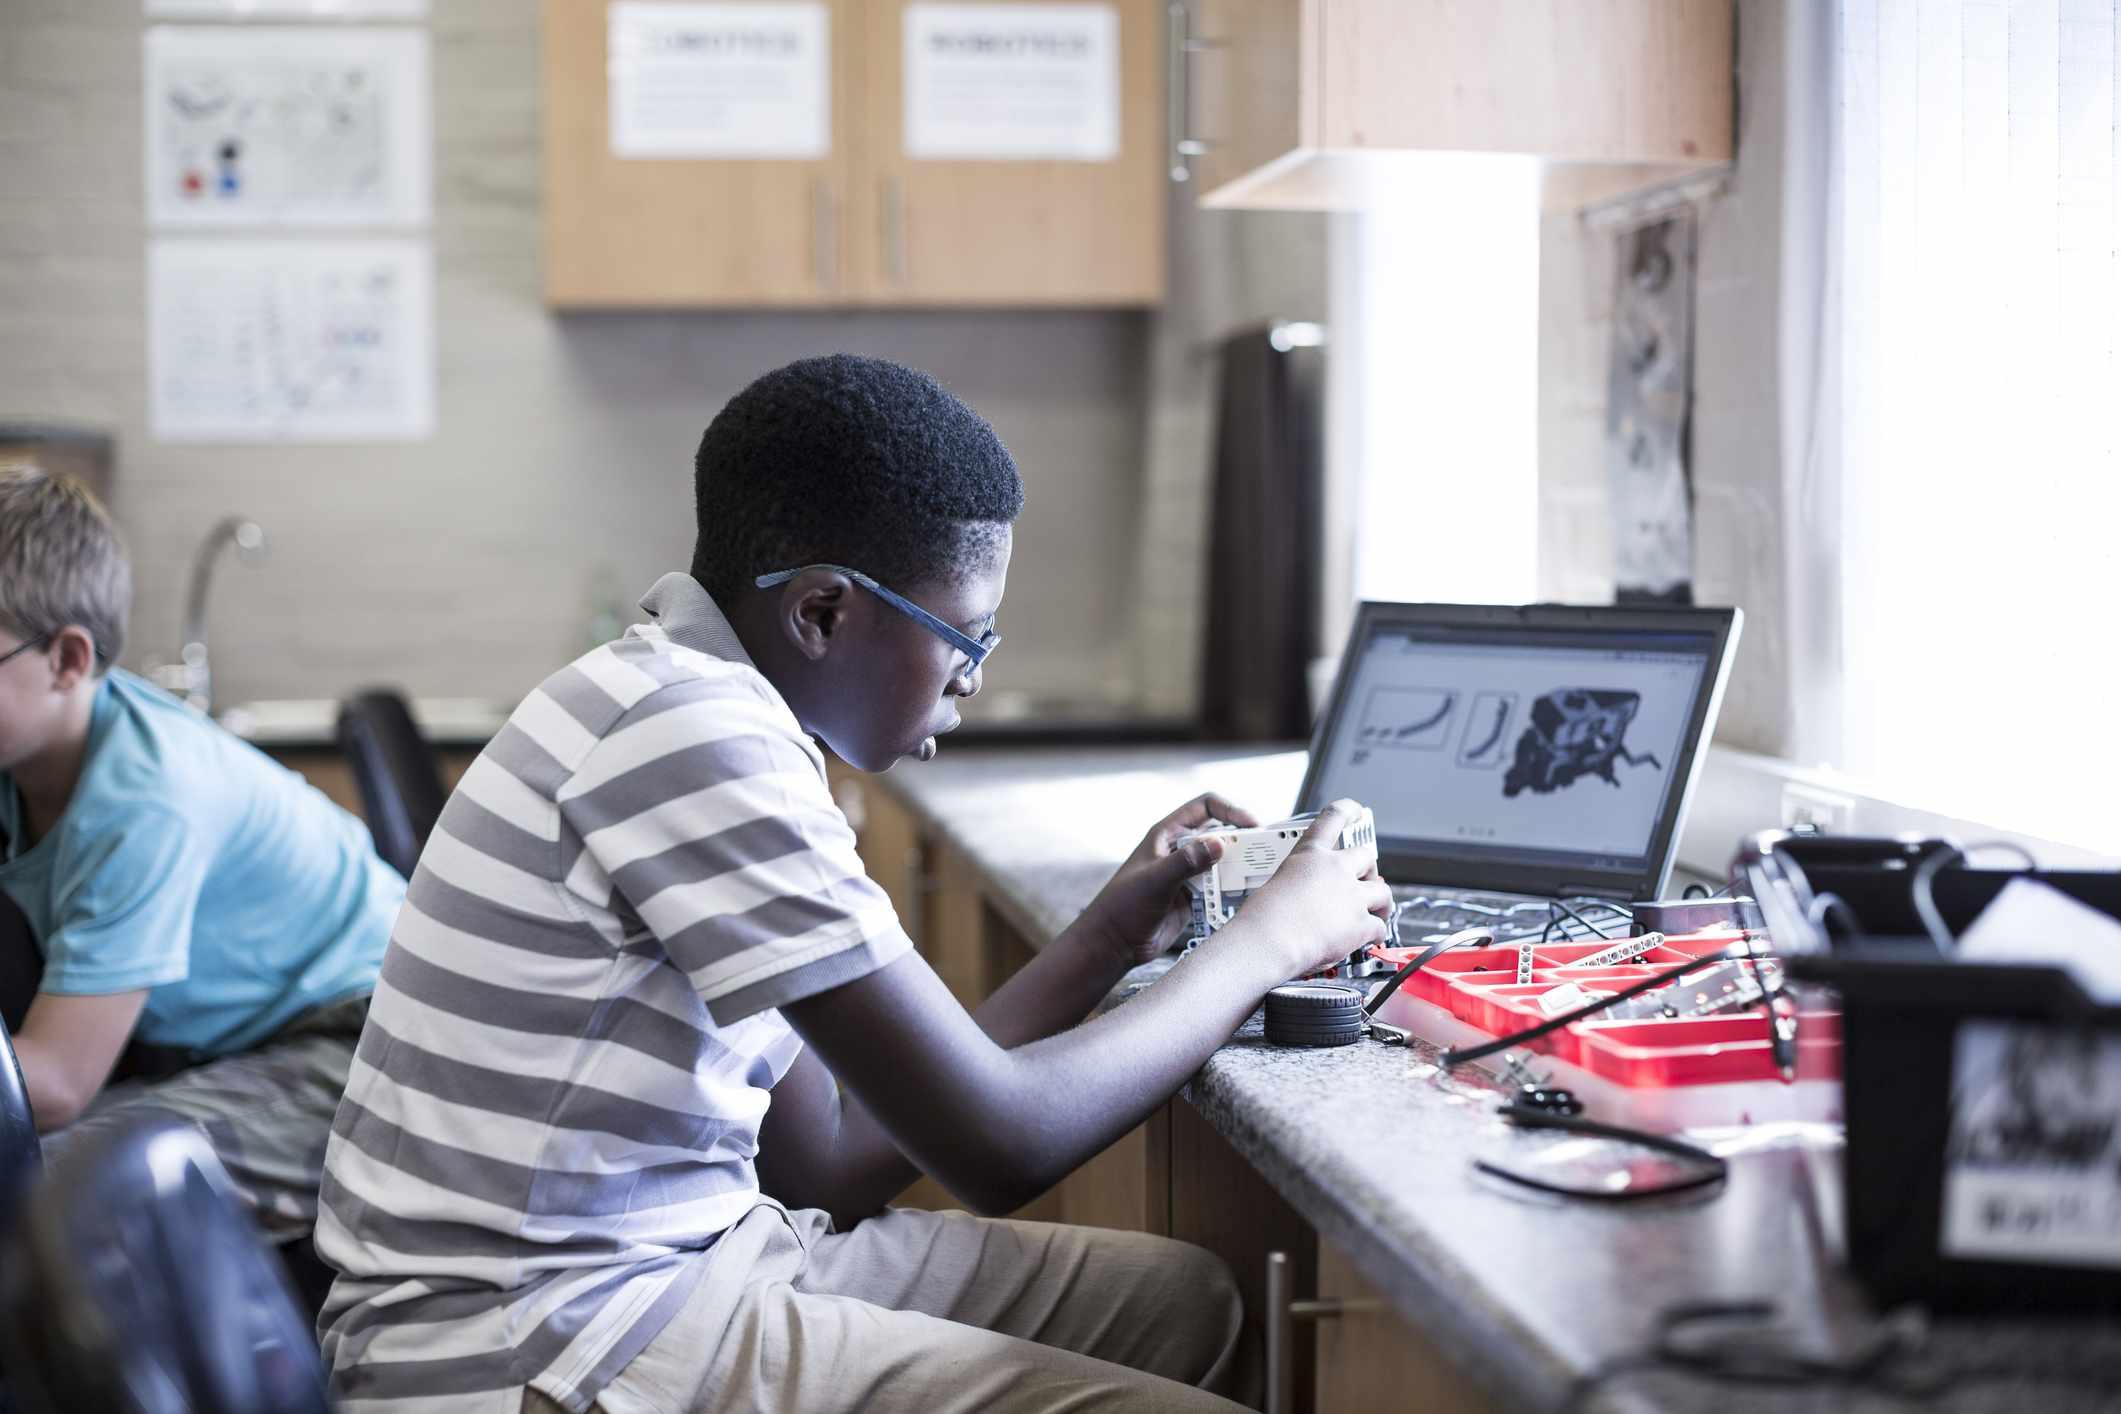 School kids working on robotics design and programming.